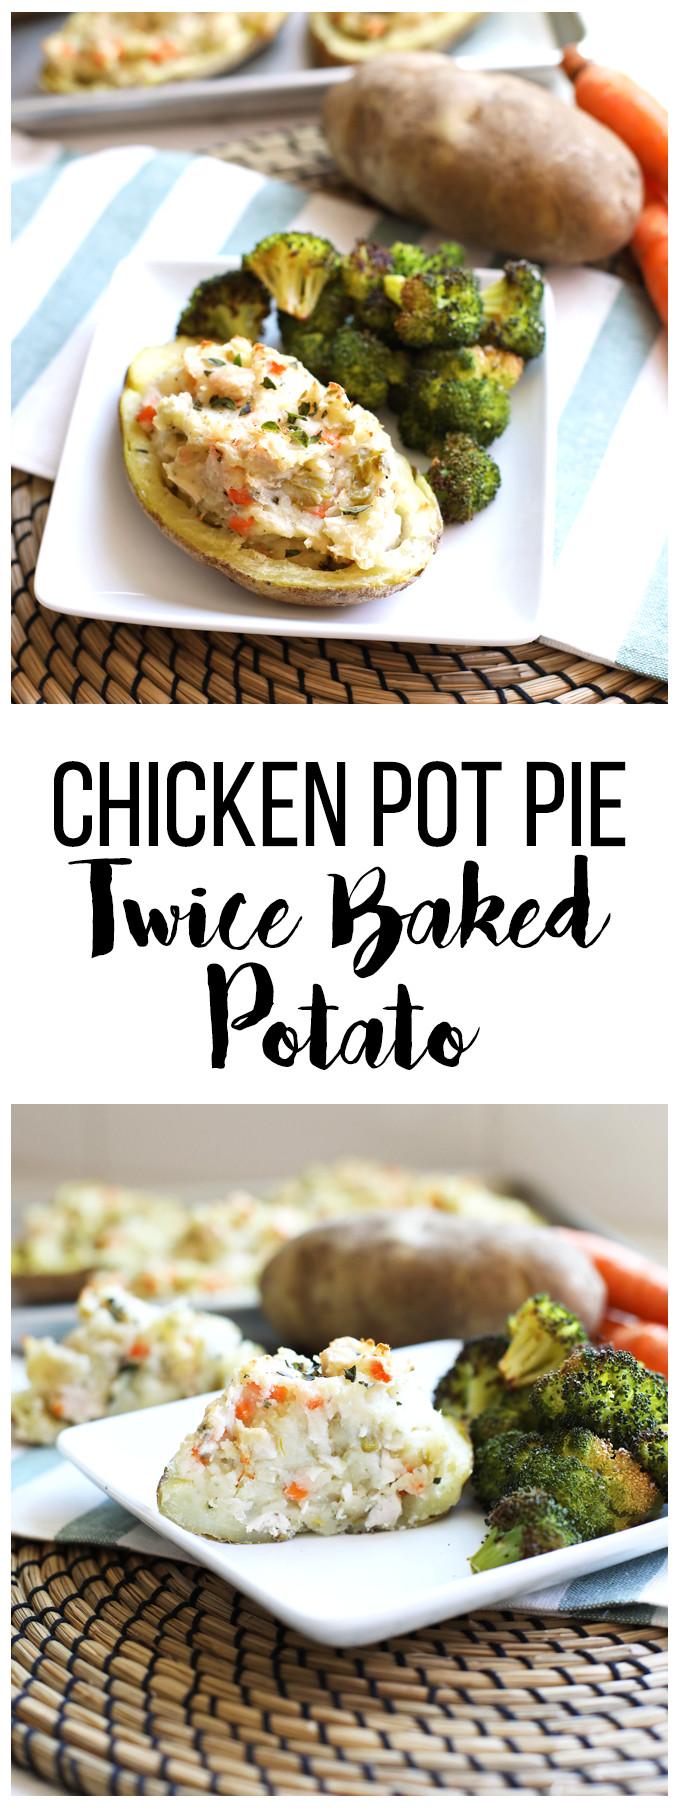 Chicken Pot Pie With Potato  Chicken Pot Pie Twice Baked Potatoes – Little Bits of…